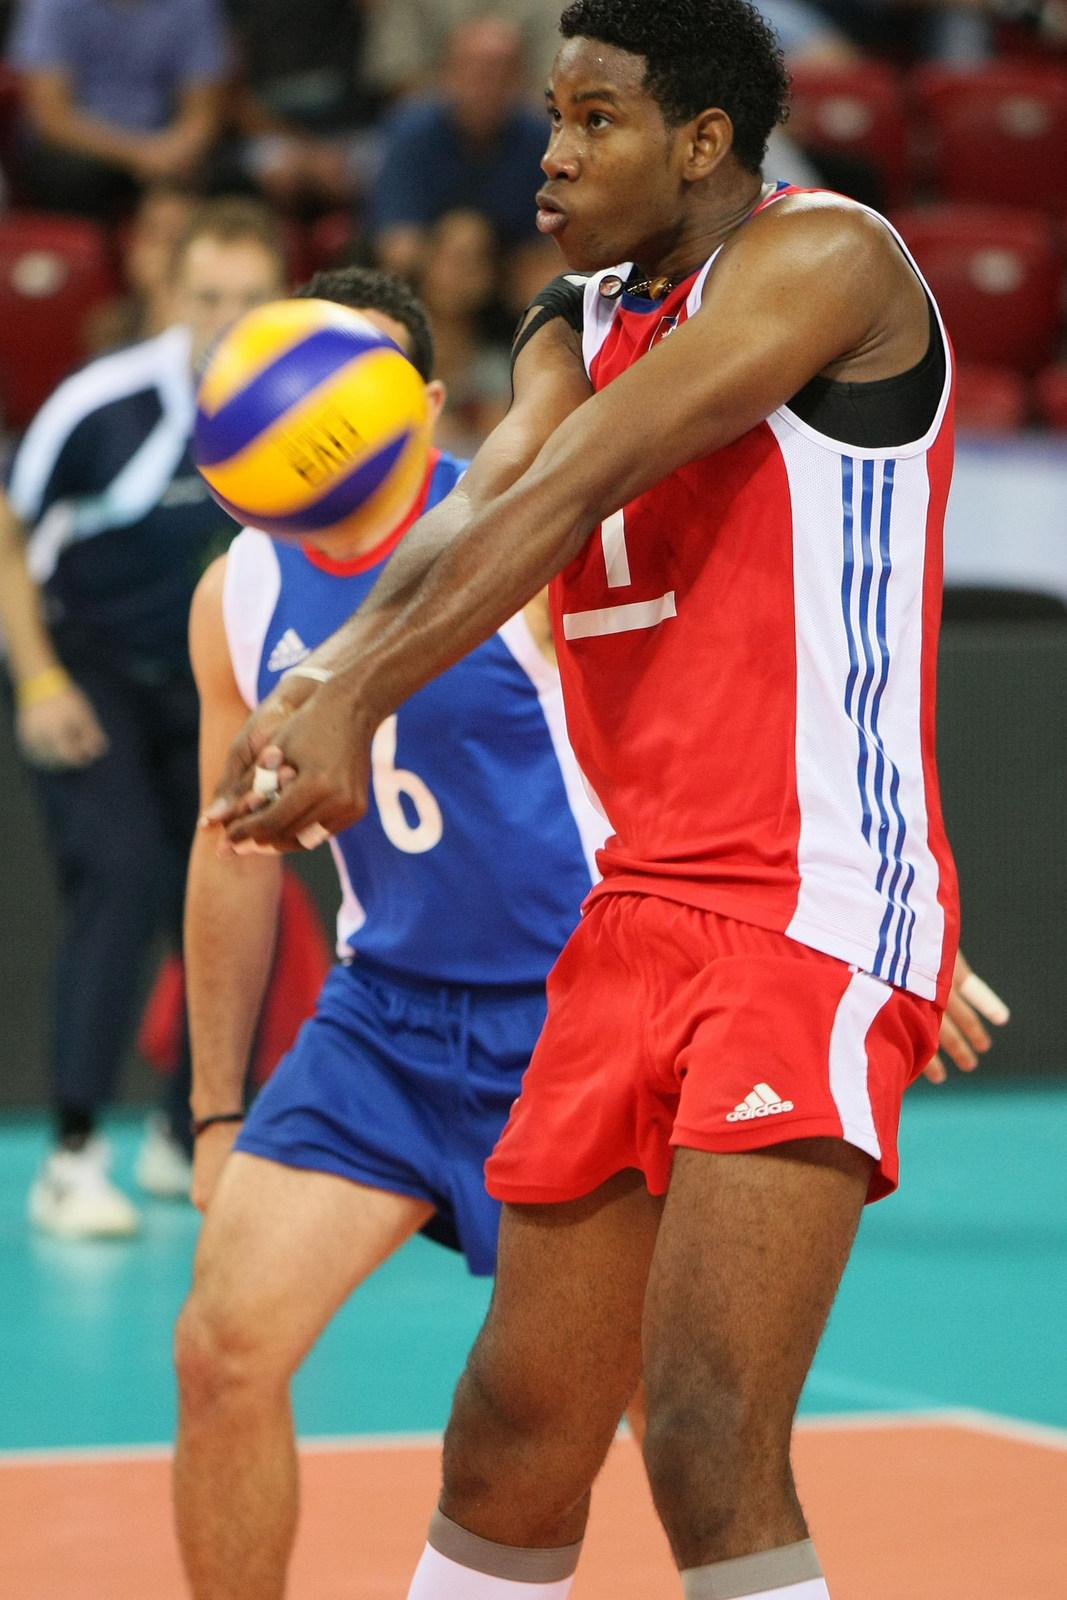 Leon Volleyball